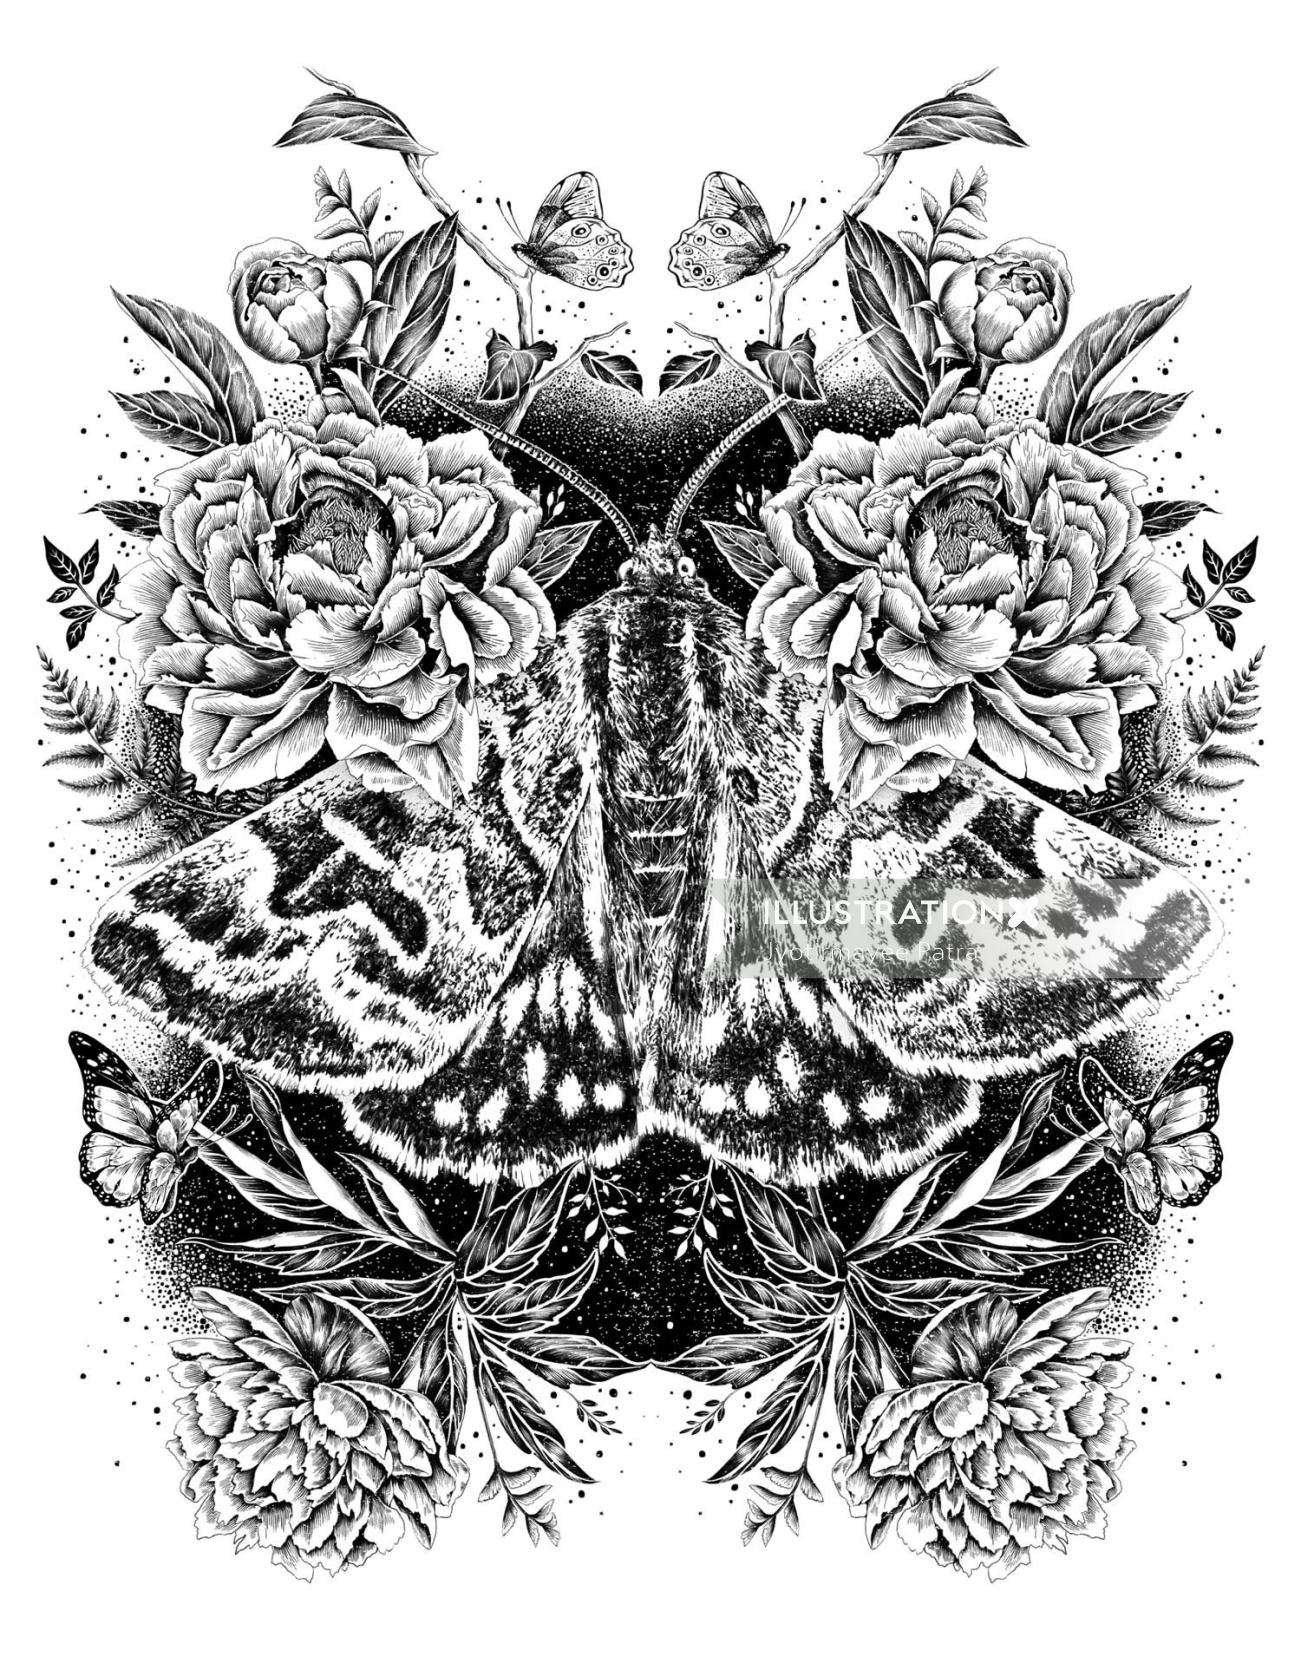 Inspired art  by Jyotirmayee Patra